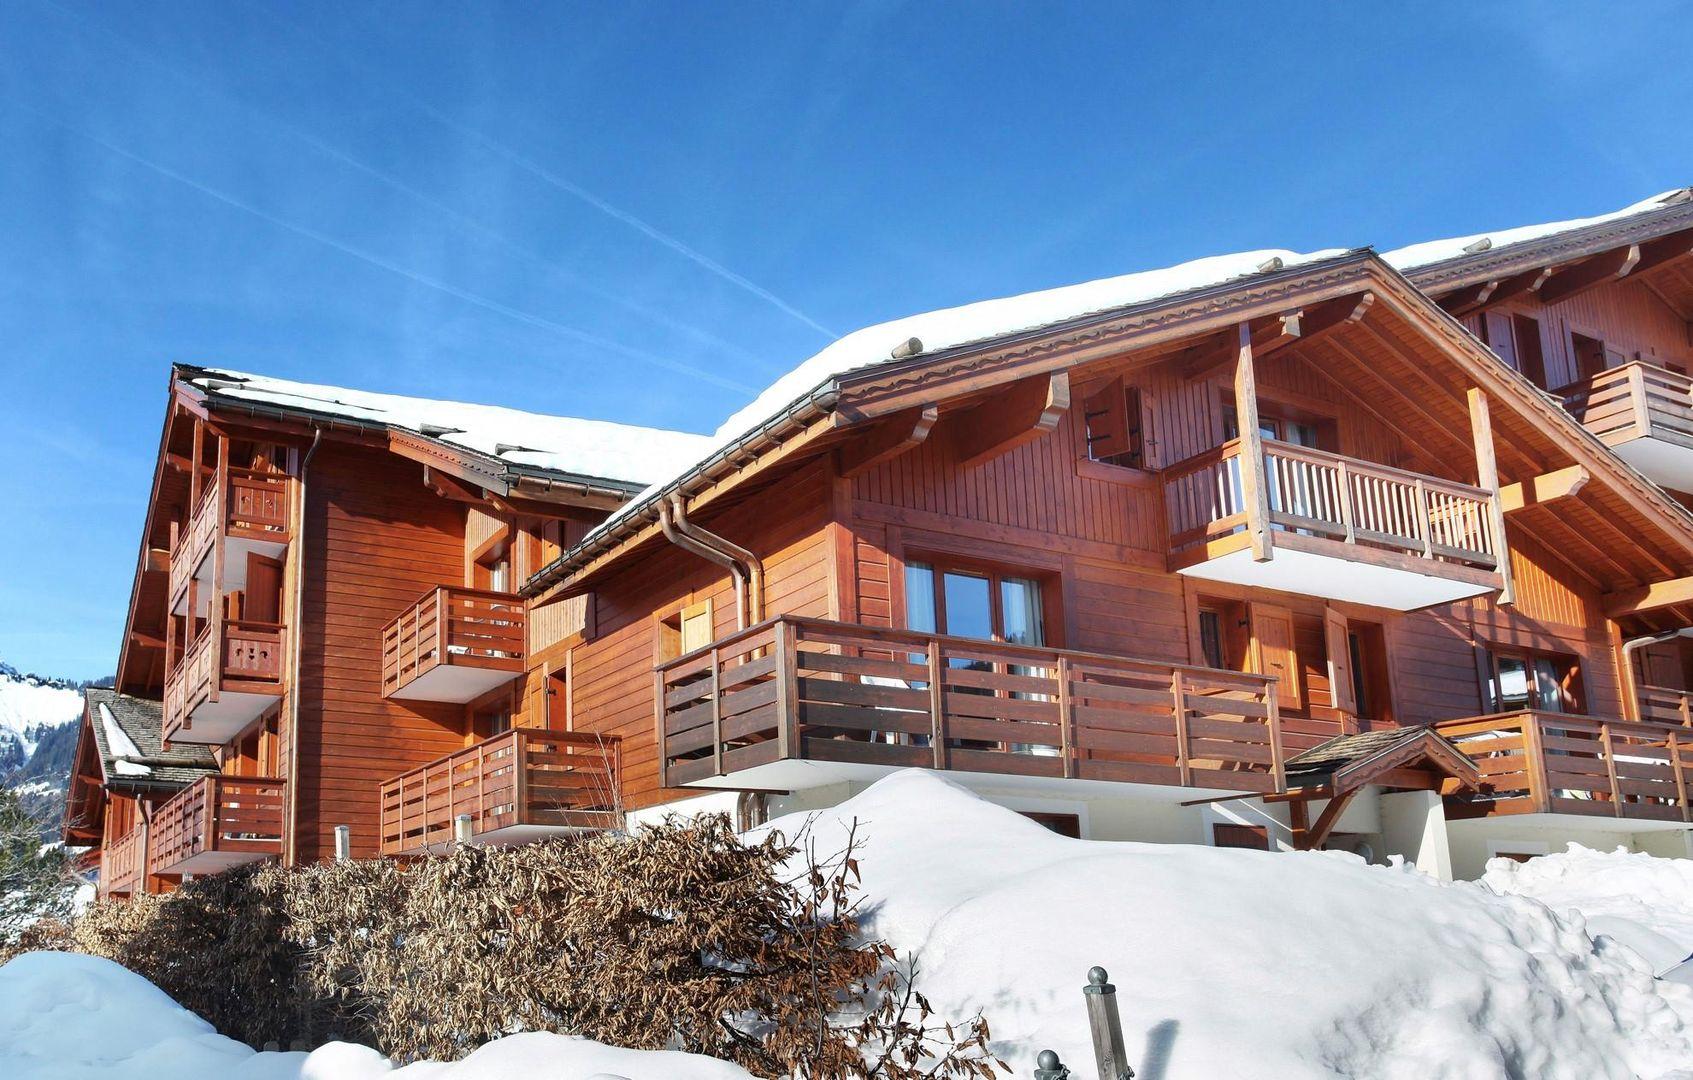 Meer info over Résidence Les Belles Roches  bij Wintertrex